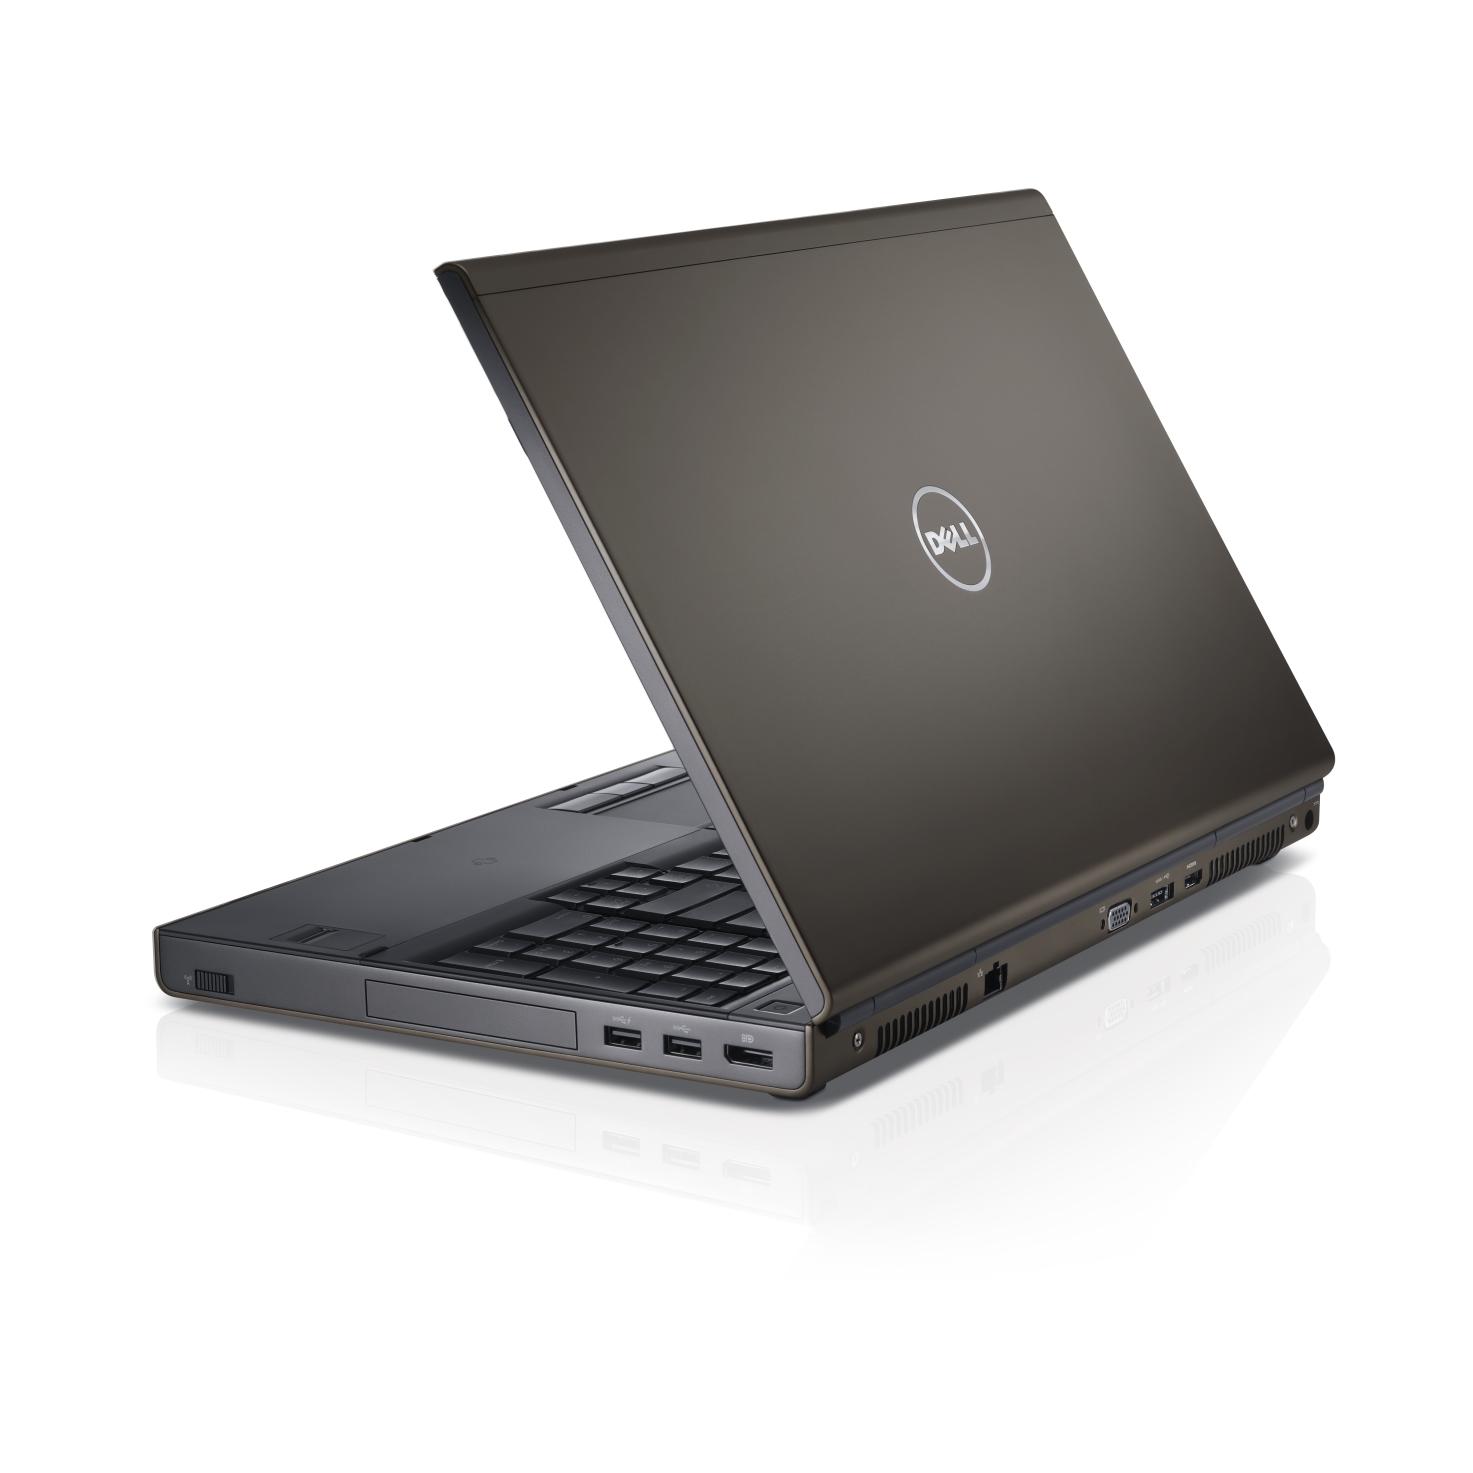 Dell Precision M4800 Intel Core i7-4800MQ X4 2.7GHz 16GB 256GB SSD,Gray (Certified Refurbished)